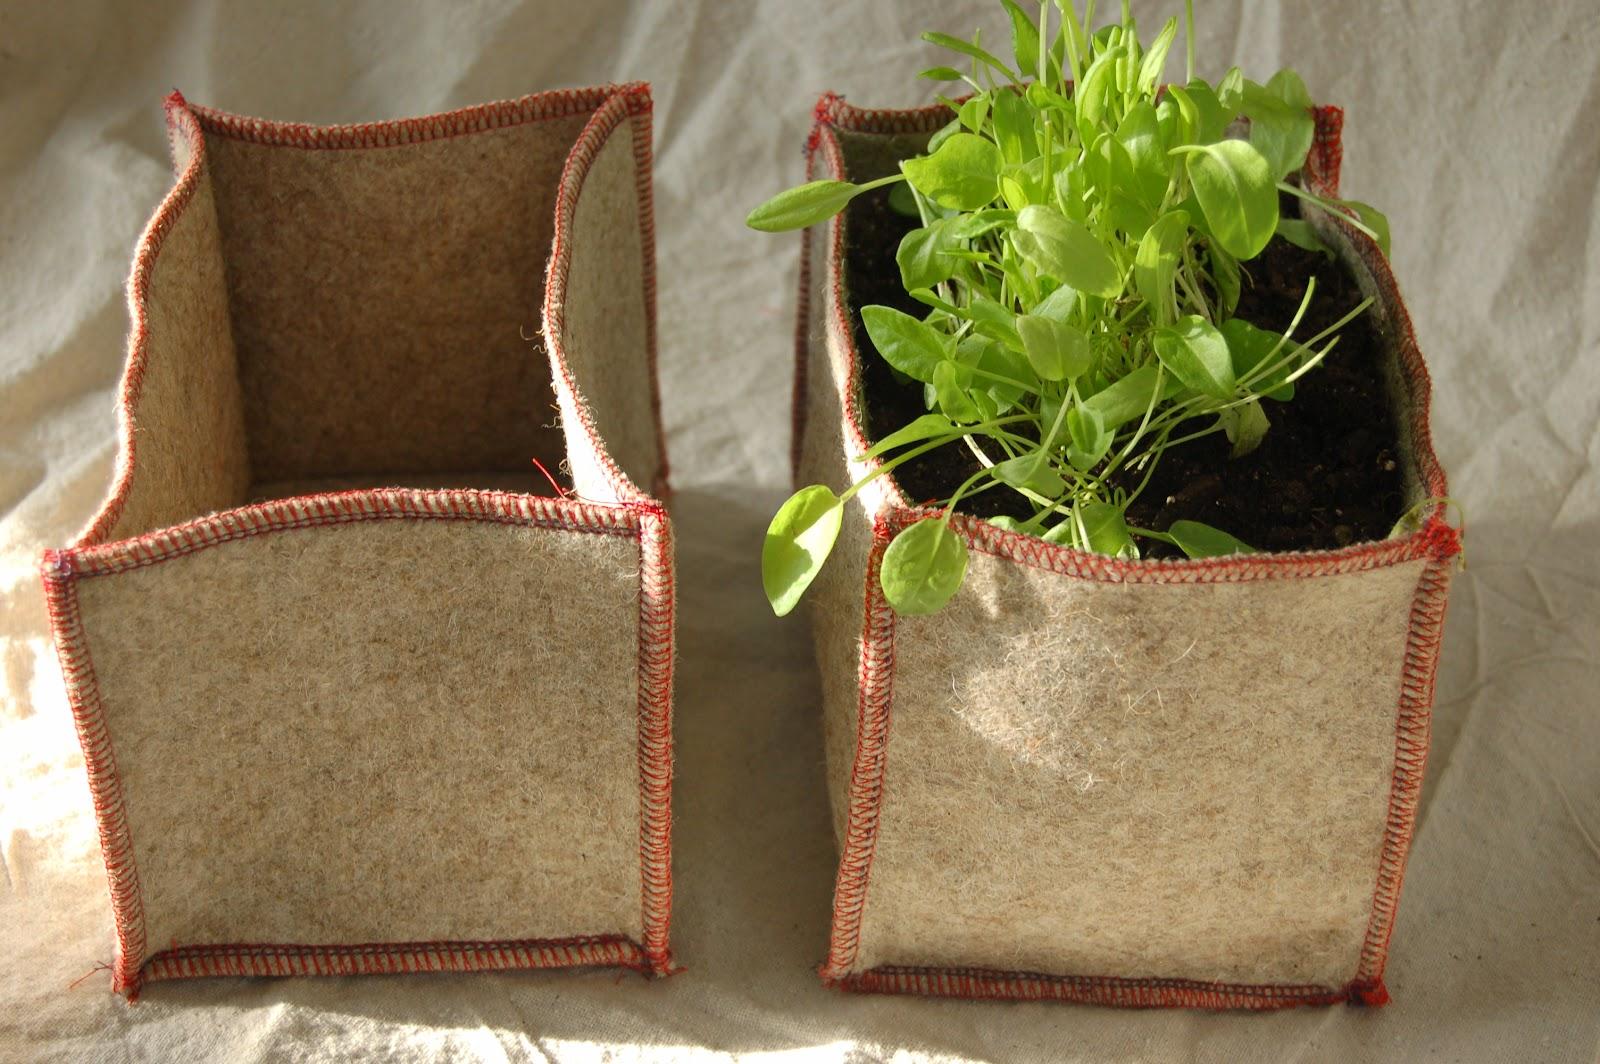 Flourish Planters & Grow Systems: Flourish Fabric Planters